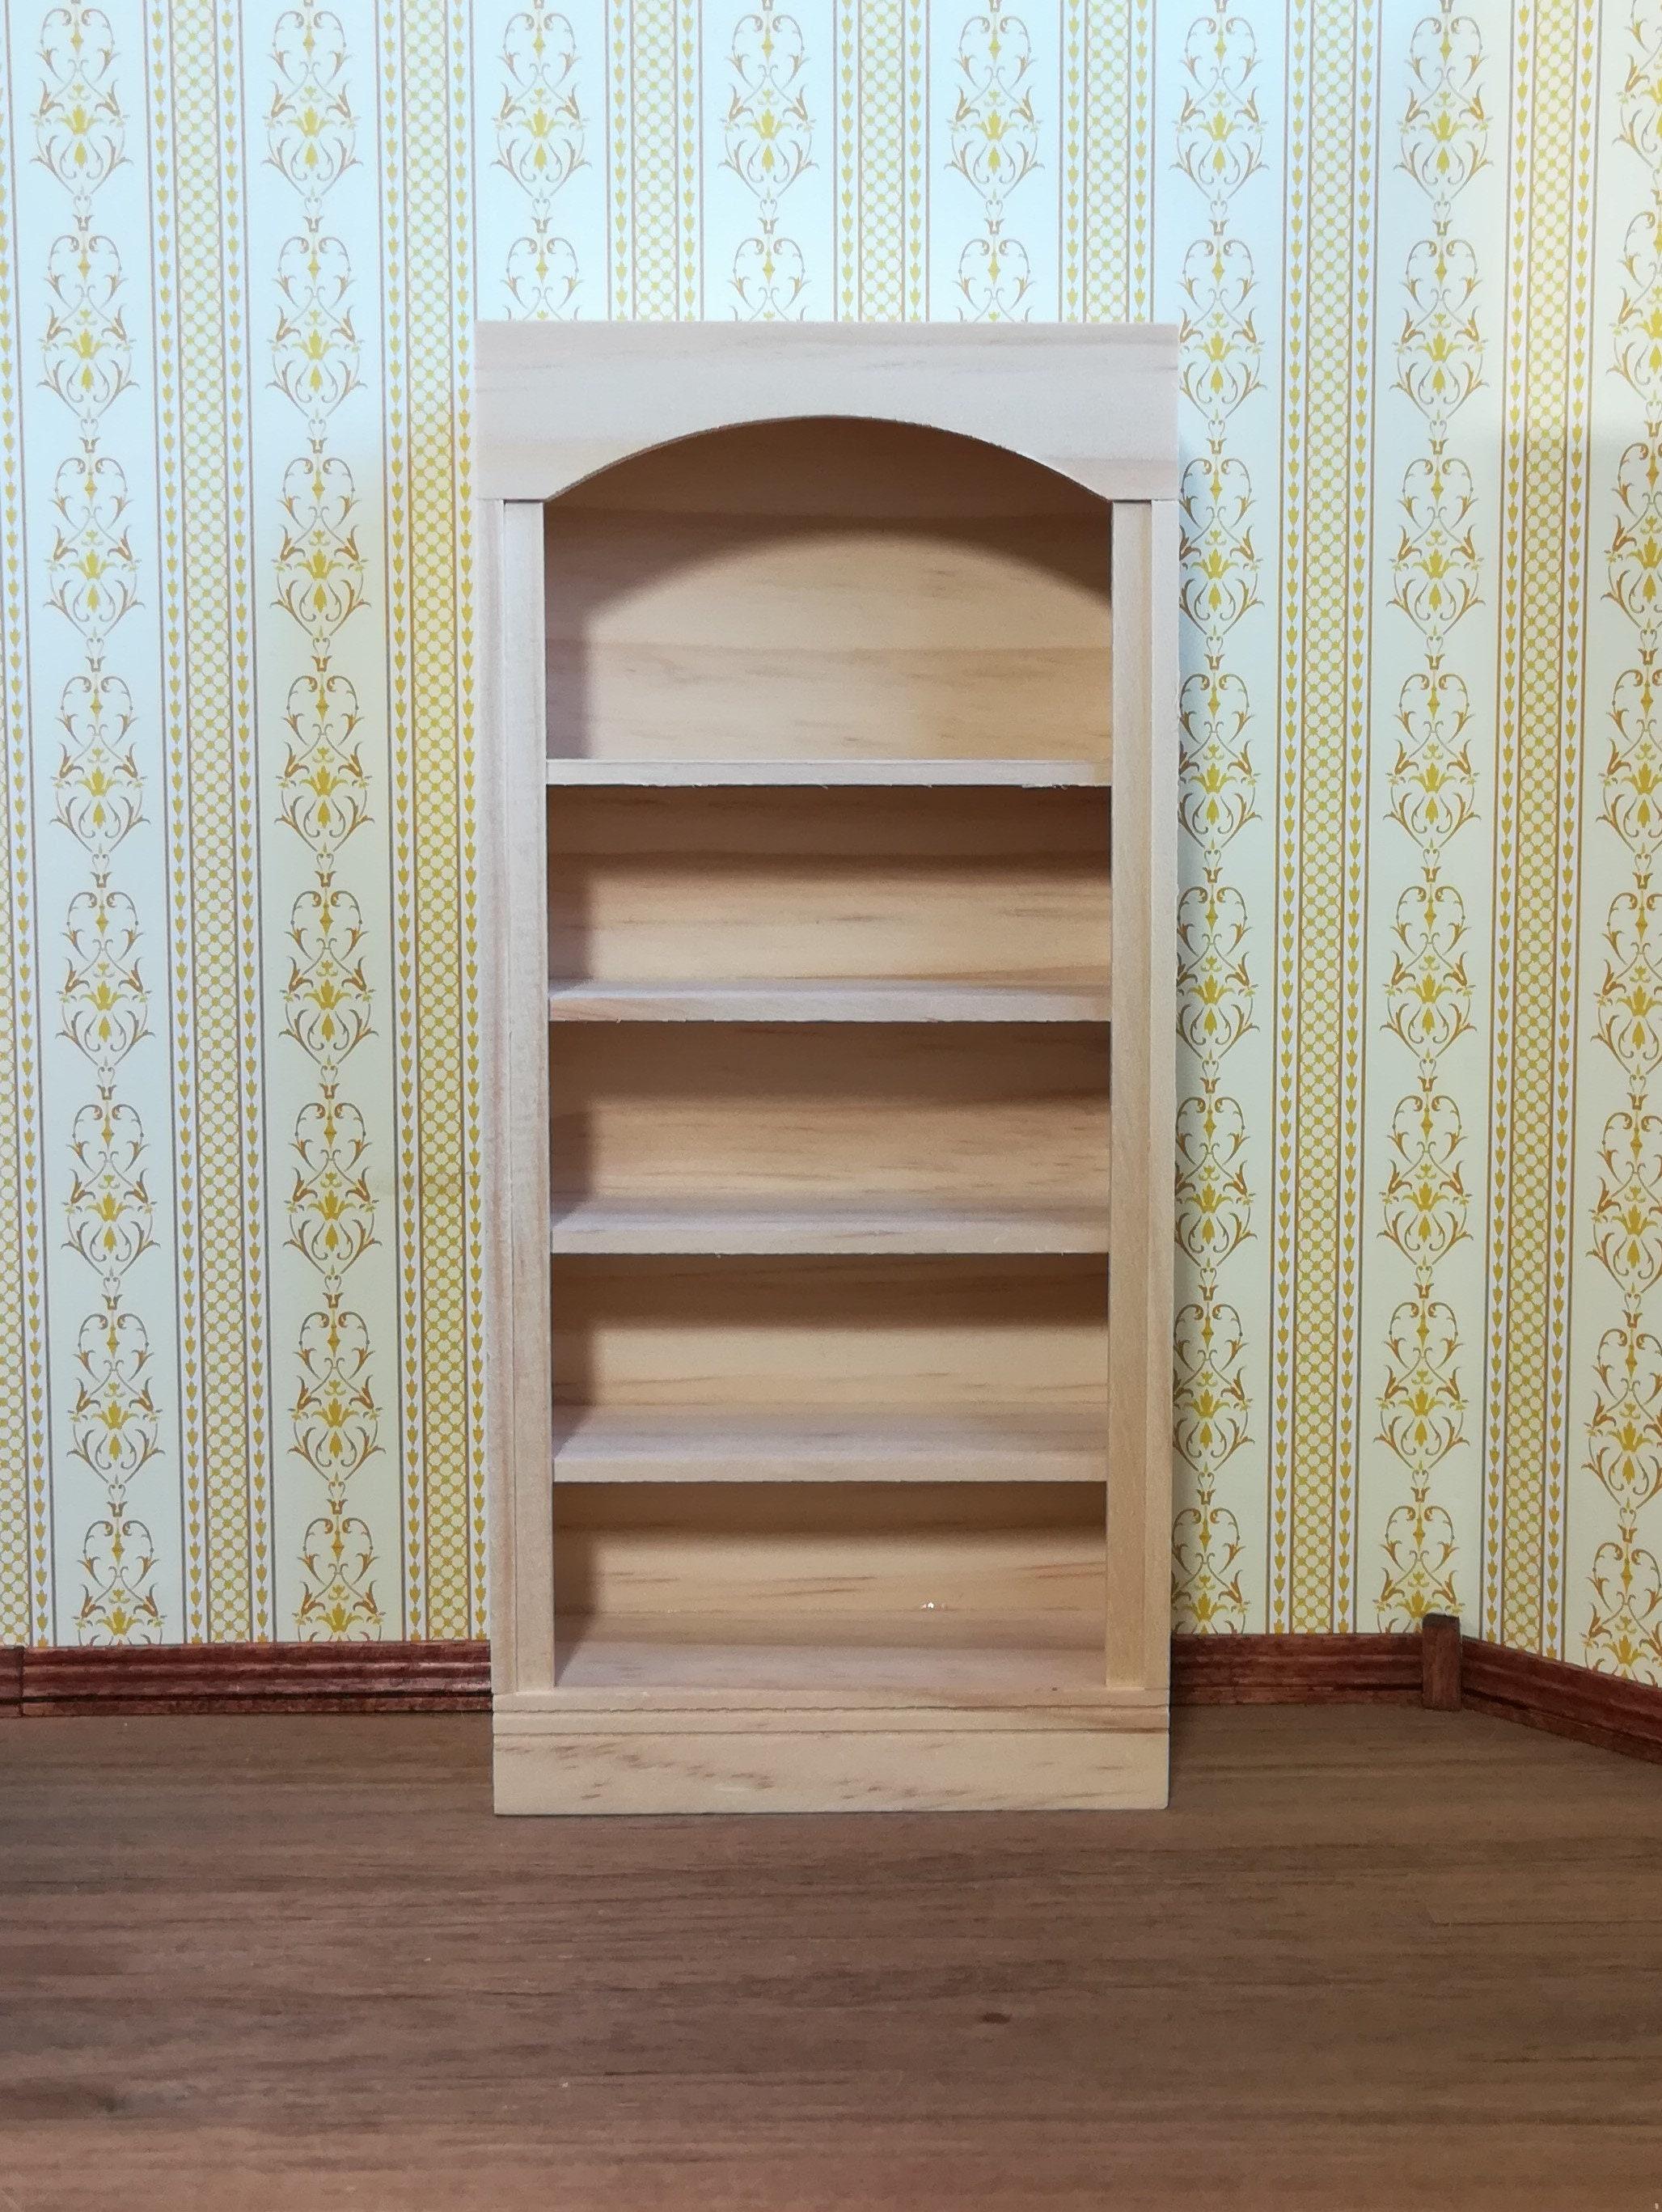 Dollhouse Miniature Bookcase 5 Shelf 1 12 Scale Unfinished